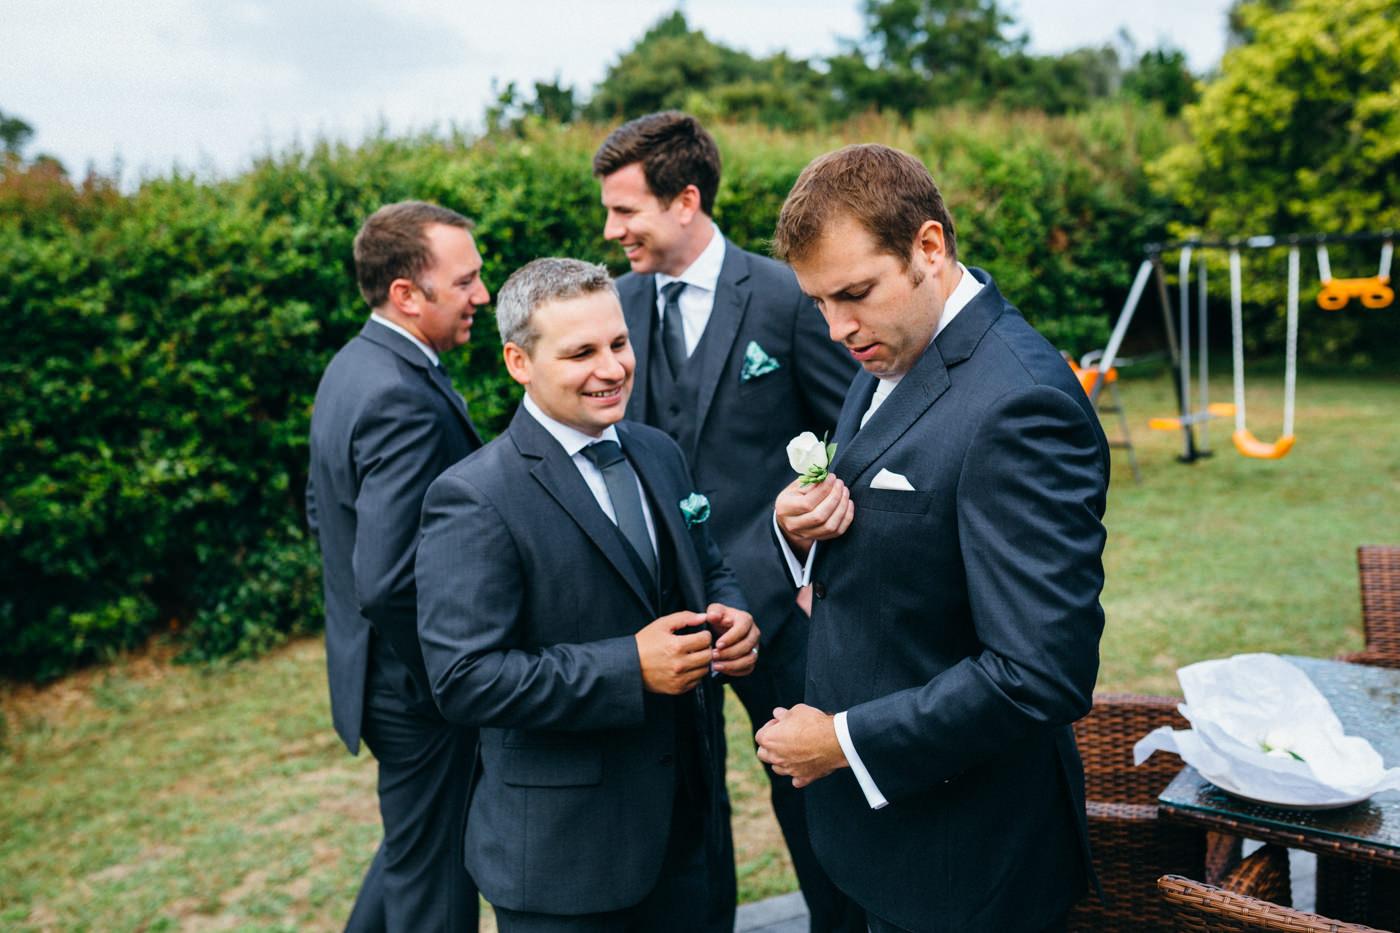 bracu_wedding_photos1013.jpg